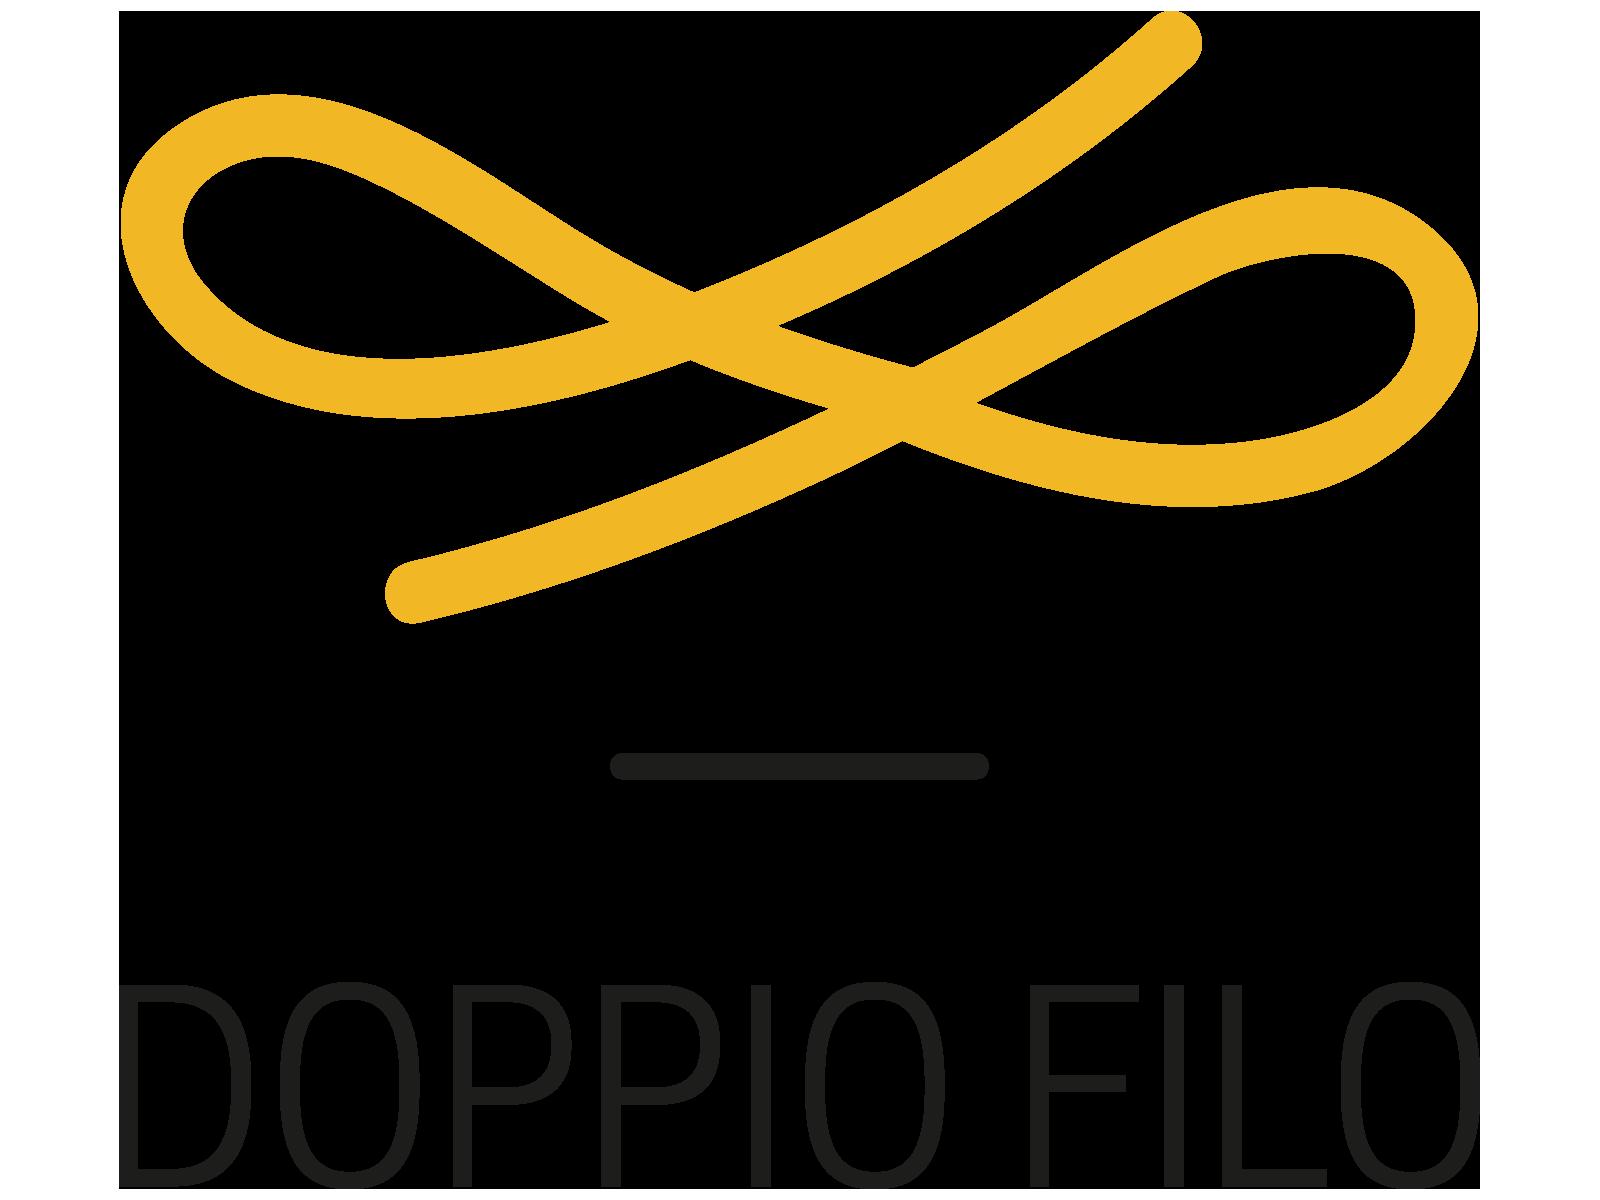 logo studio doppiofilo design educazione romans d isonzo gorizia